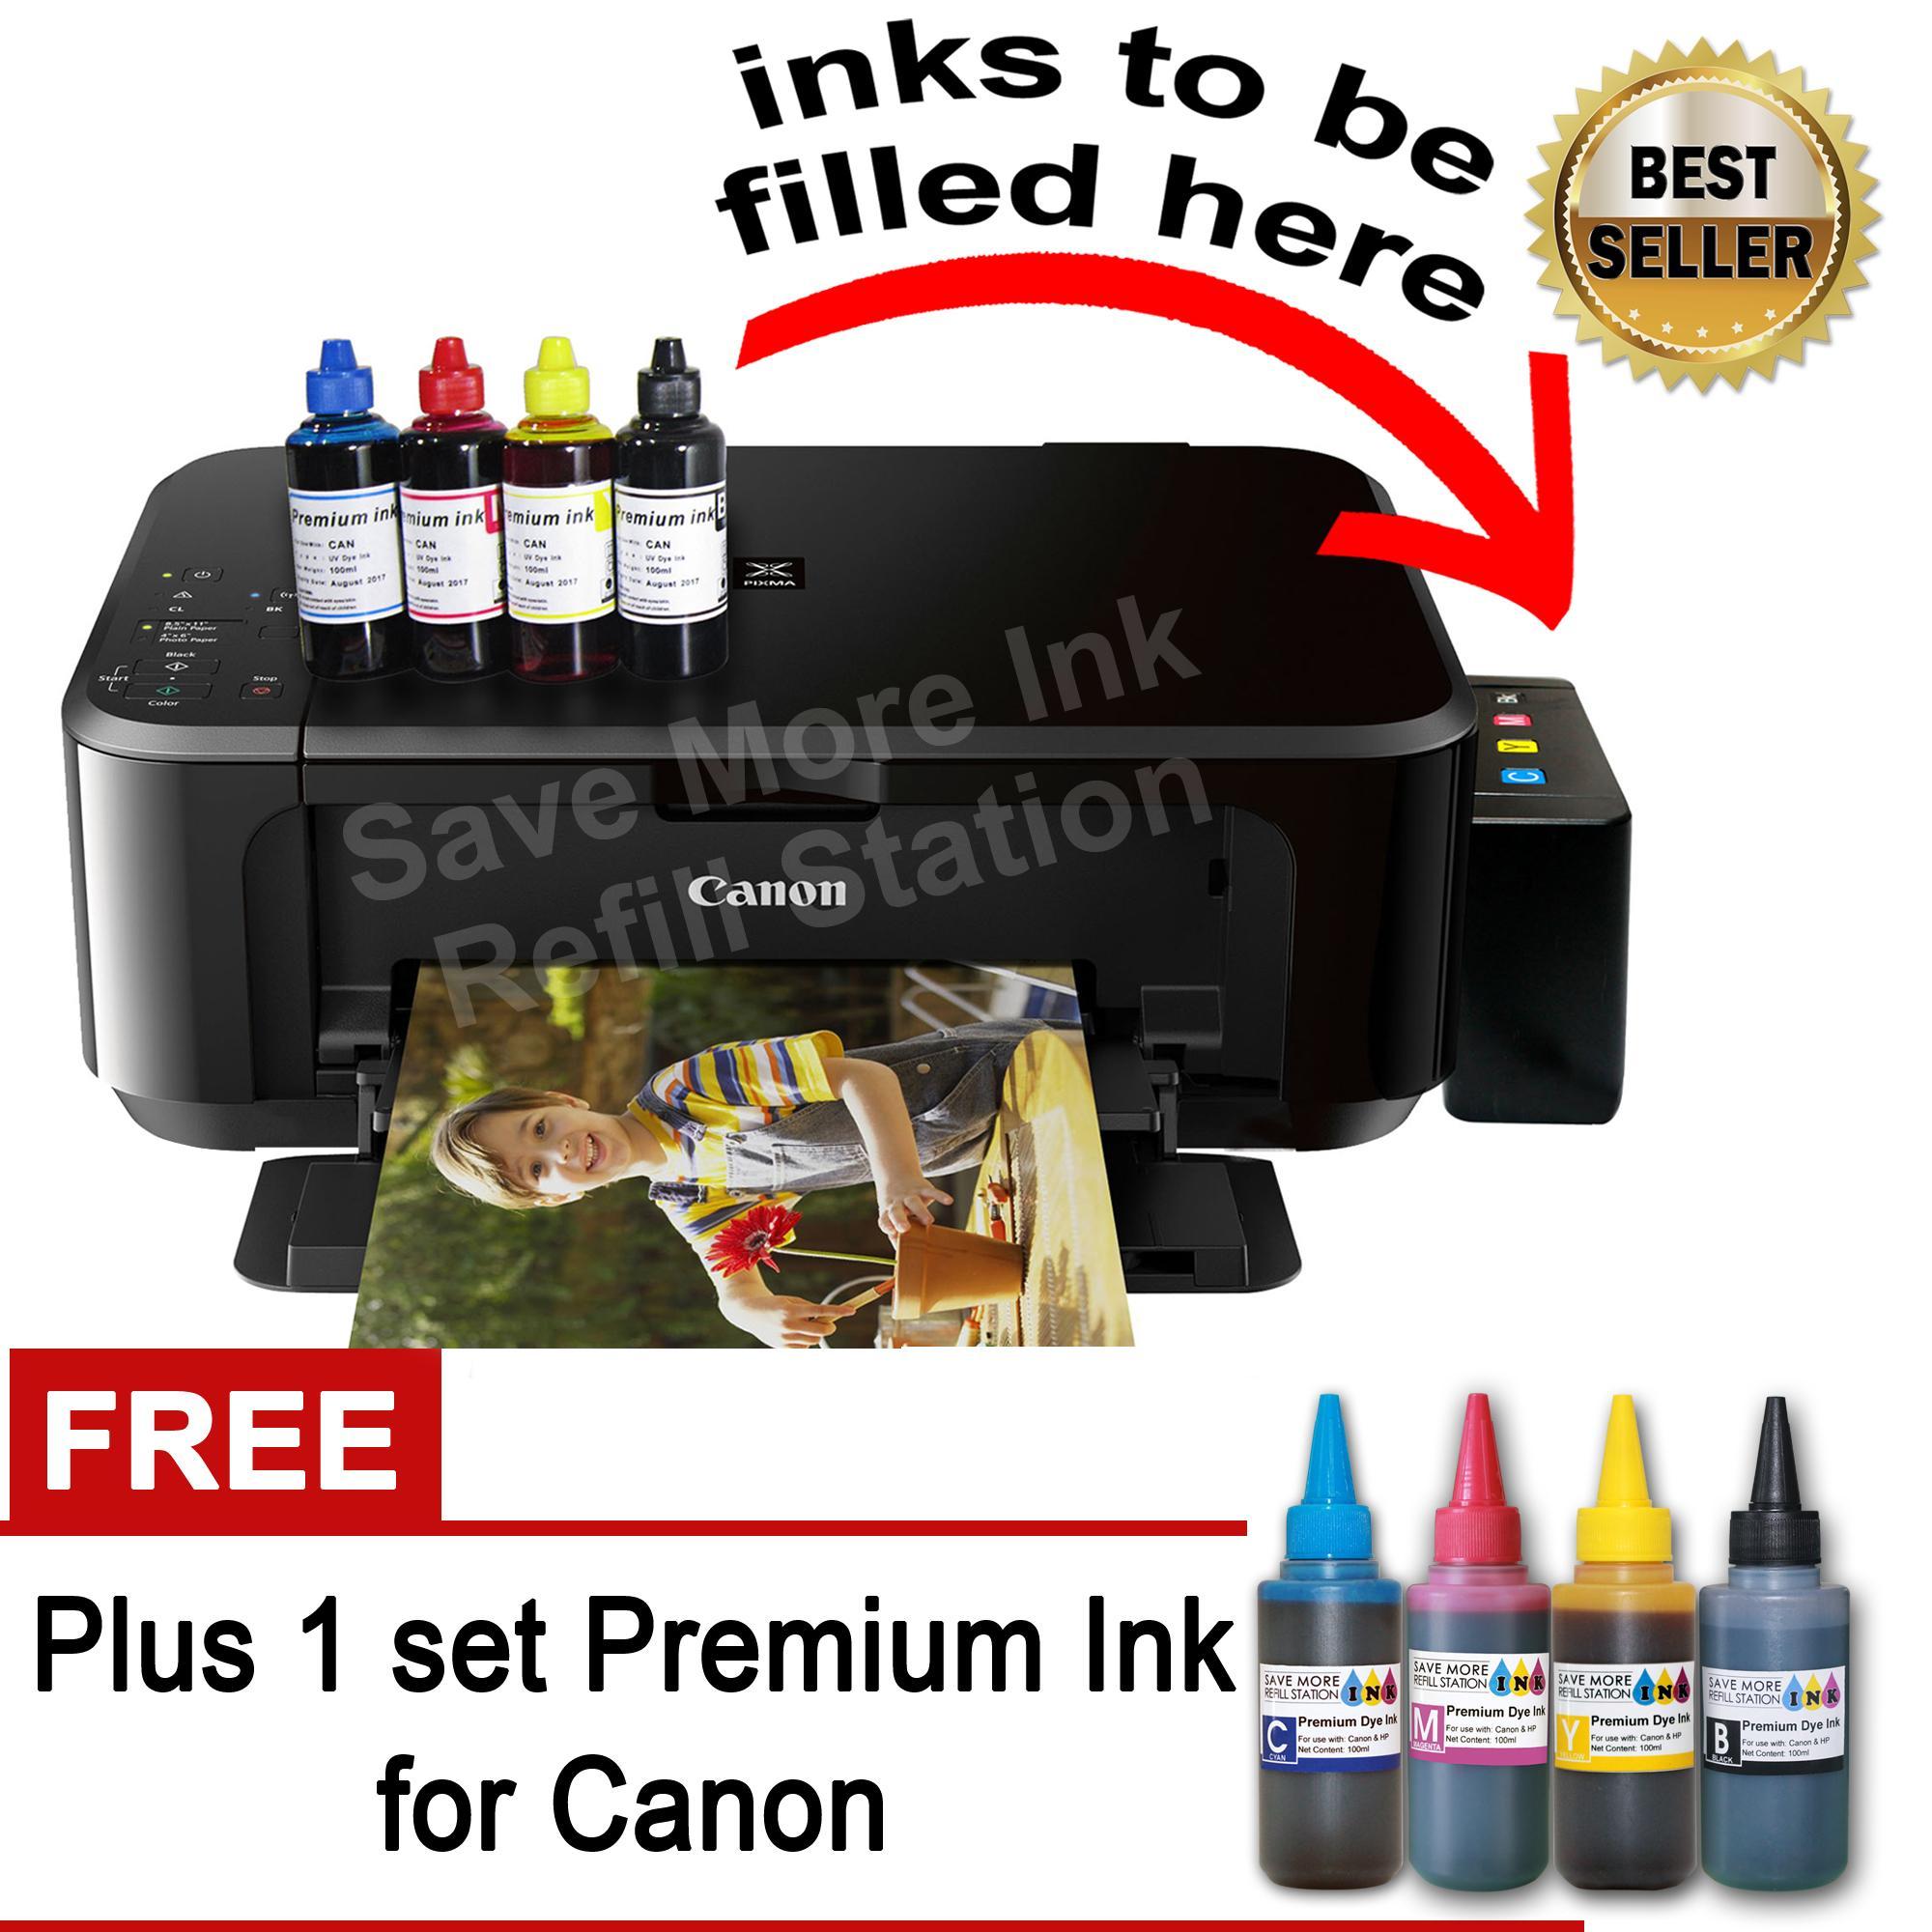 Canon MG3620 6 in 1 Printer w CiSS Wireless Duplex Print